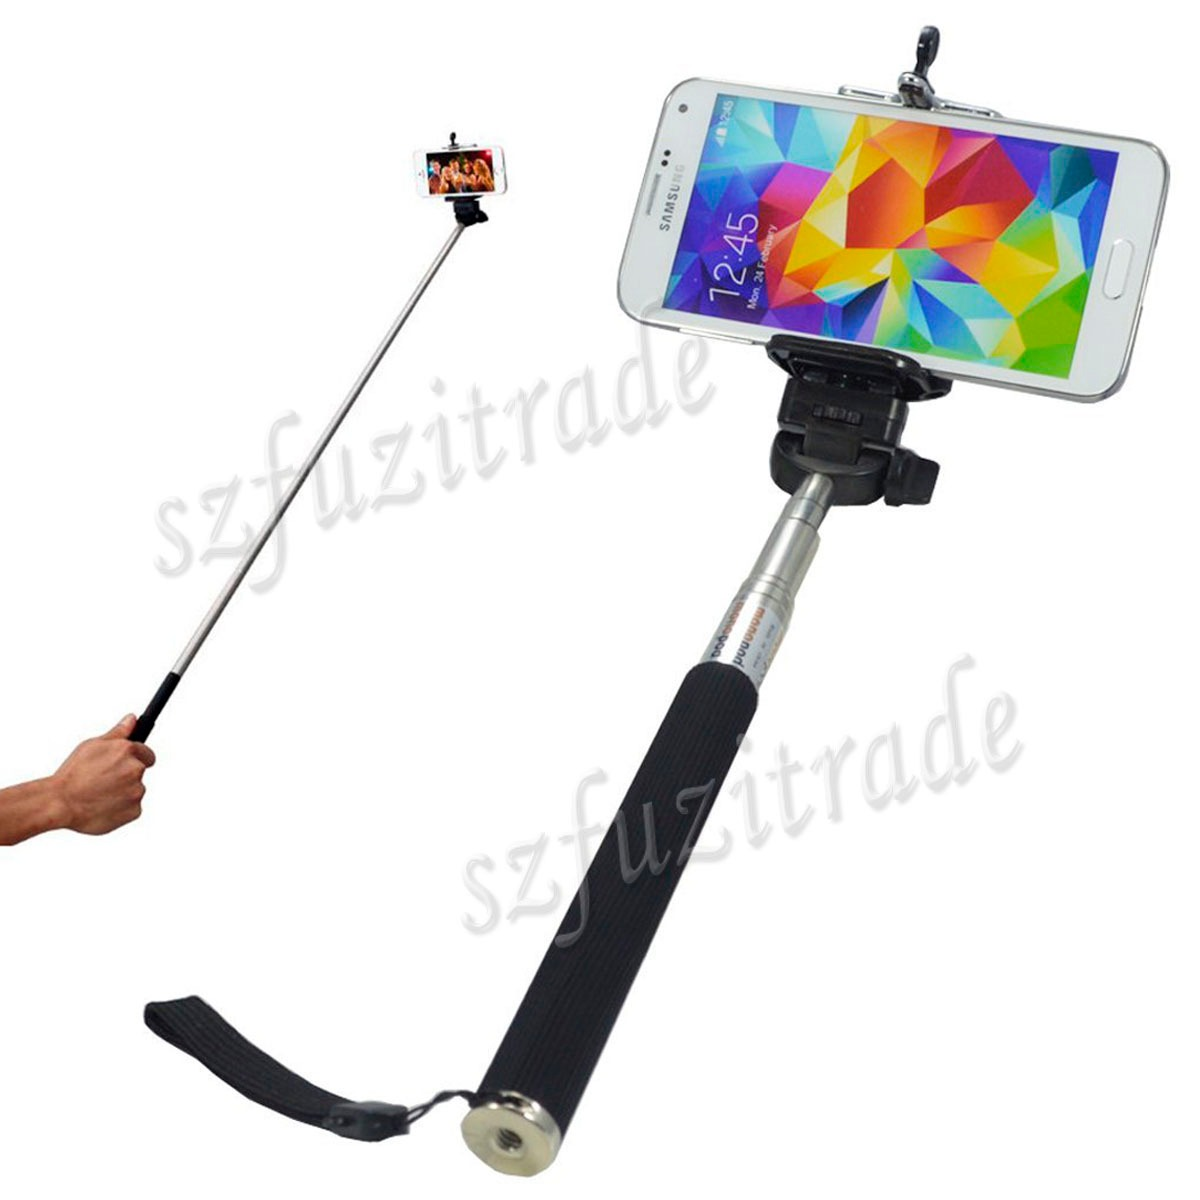 retractable handy stick selfie holder mount monopod for camera iphone 6s 6 plus ebay. Black Bedroom Furniture Sets. Home Design Ideas